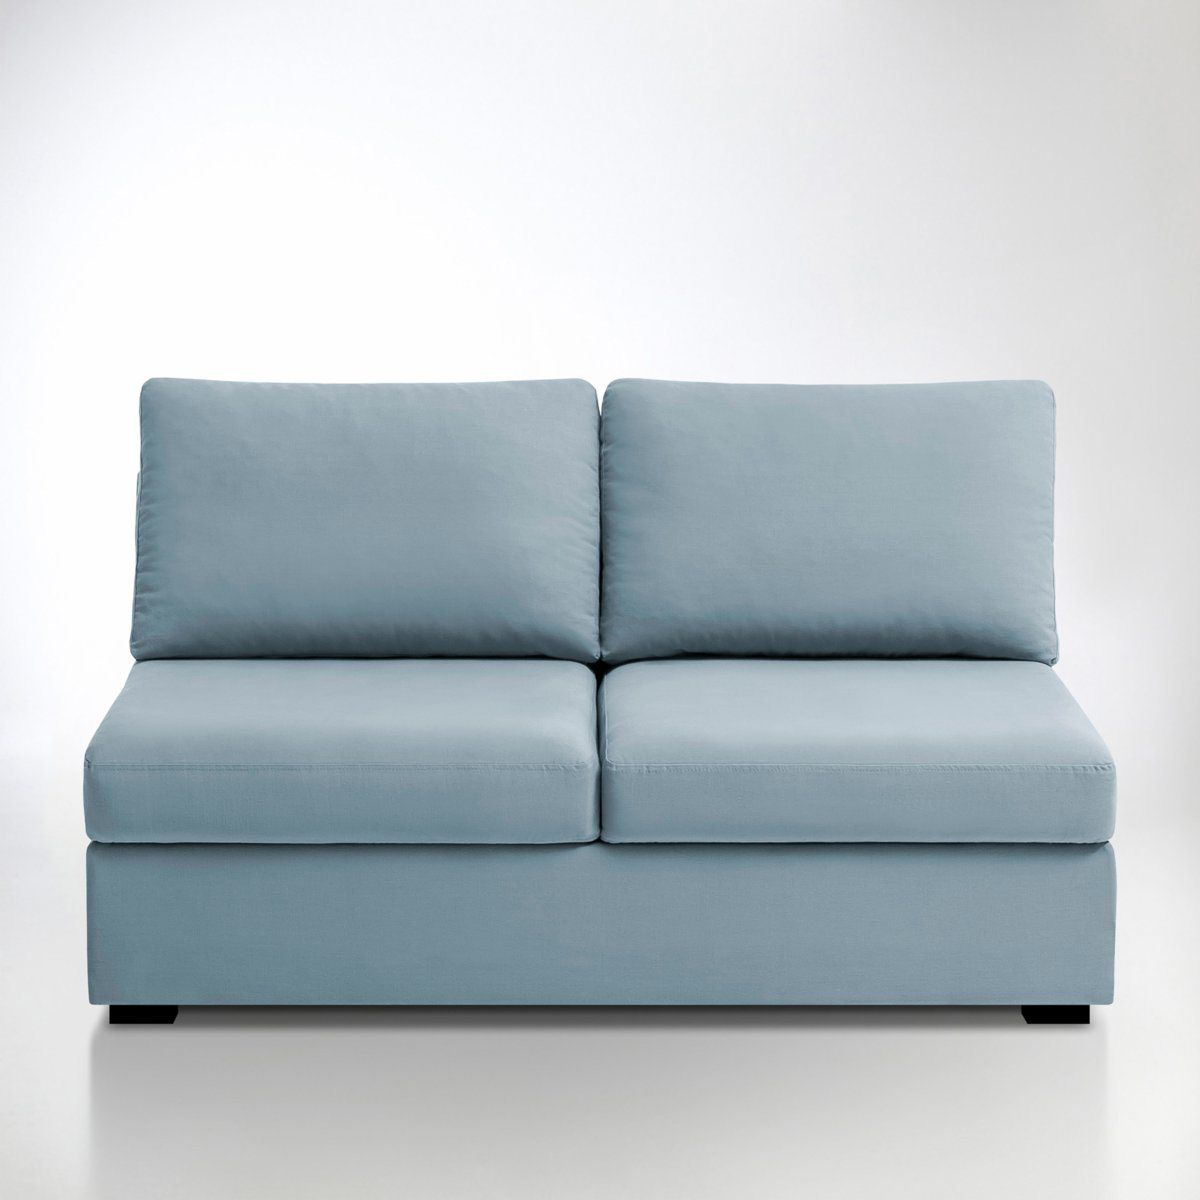 Pin By Laura Sanders On Joanne Sofa Furniture Home Deco Robin